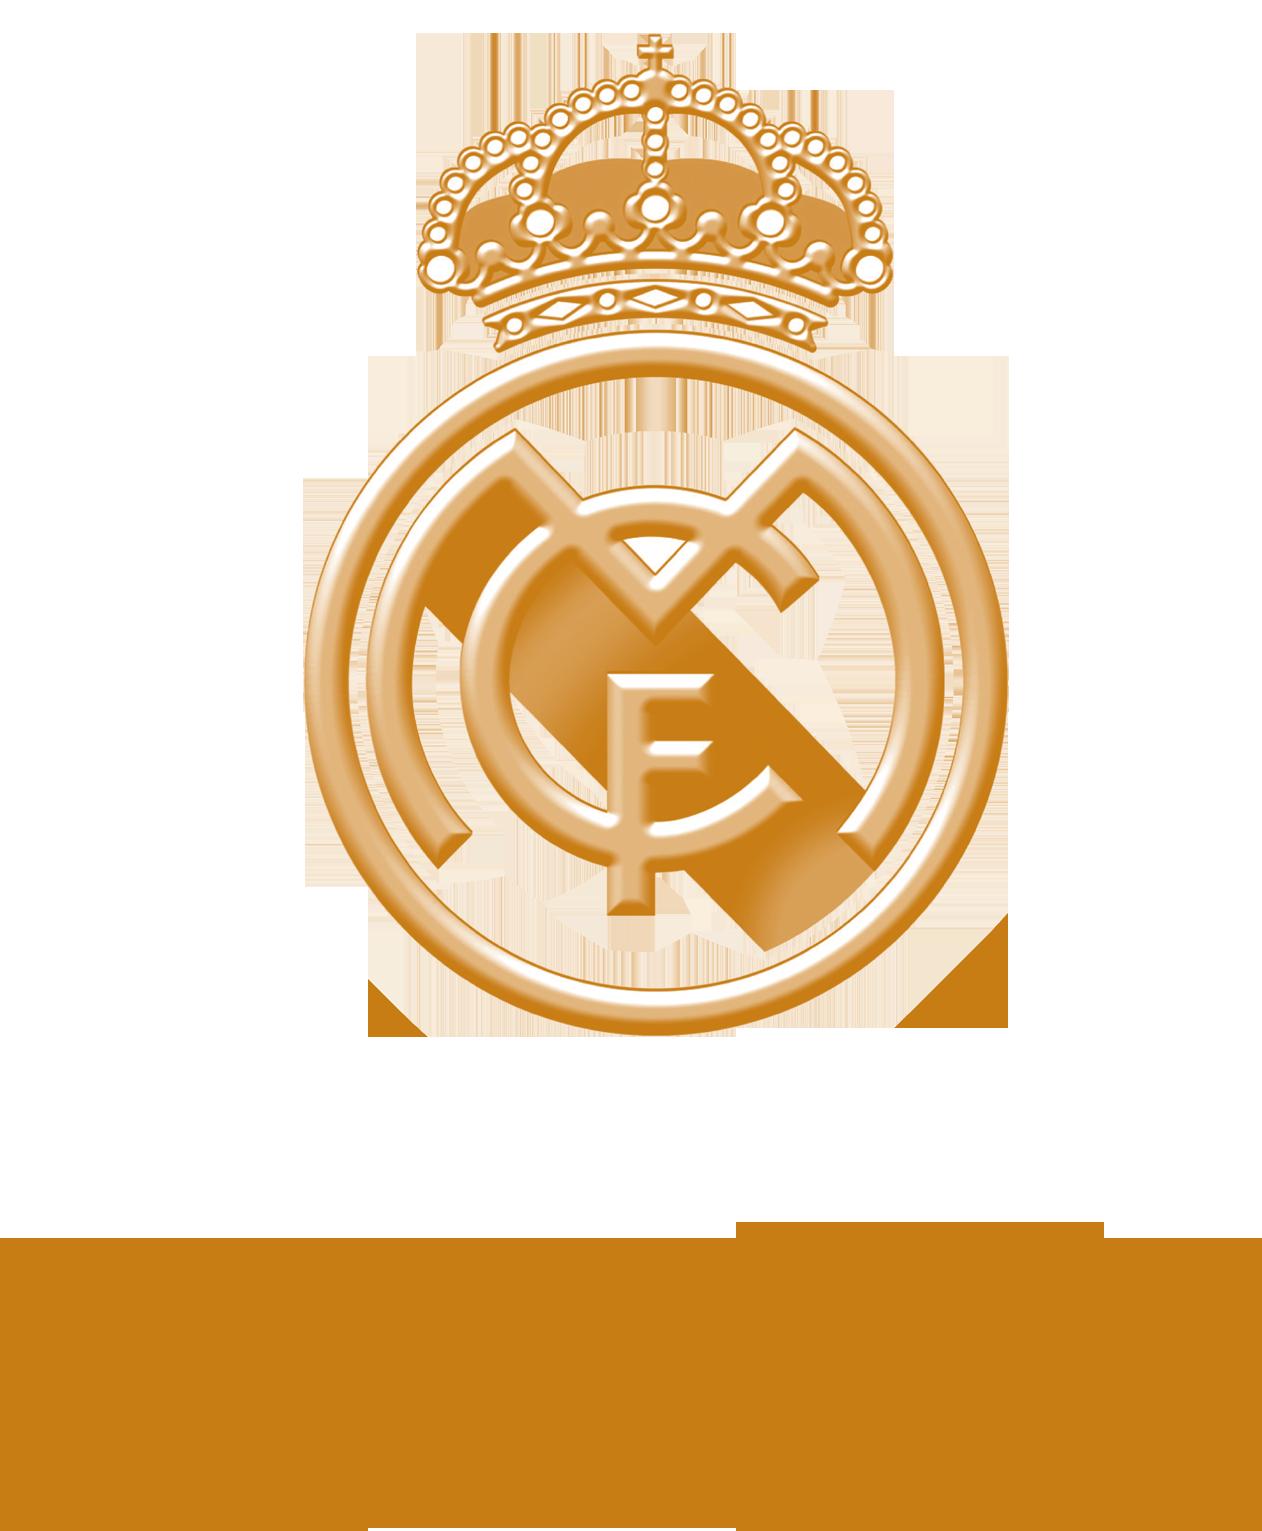 Ruya Real Madrid